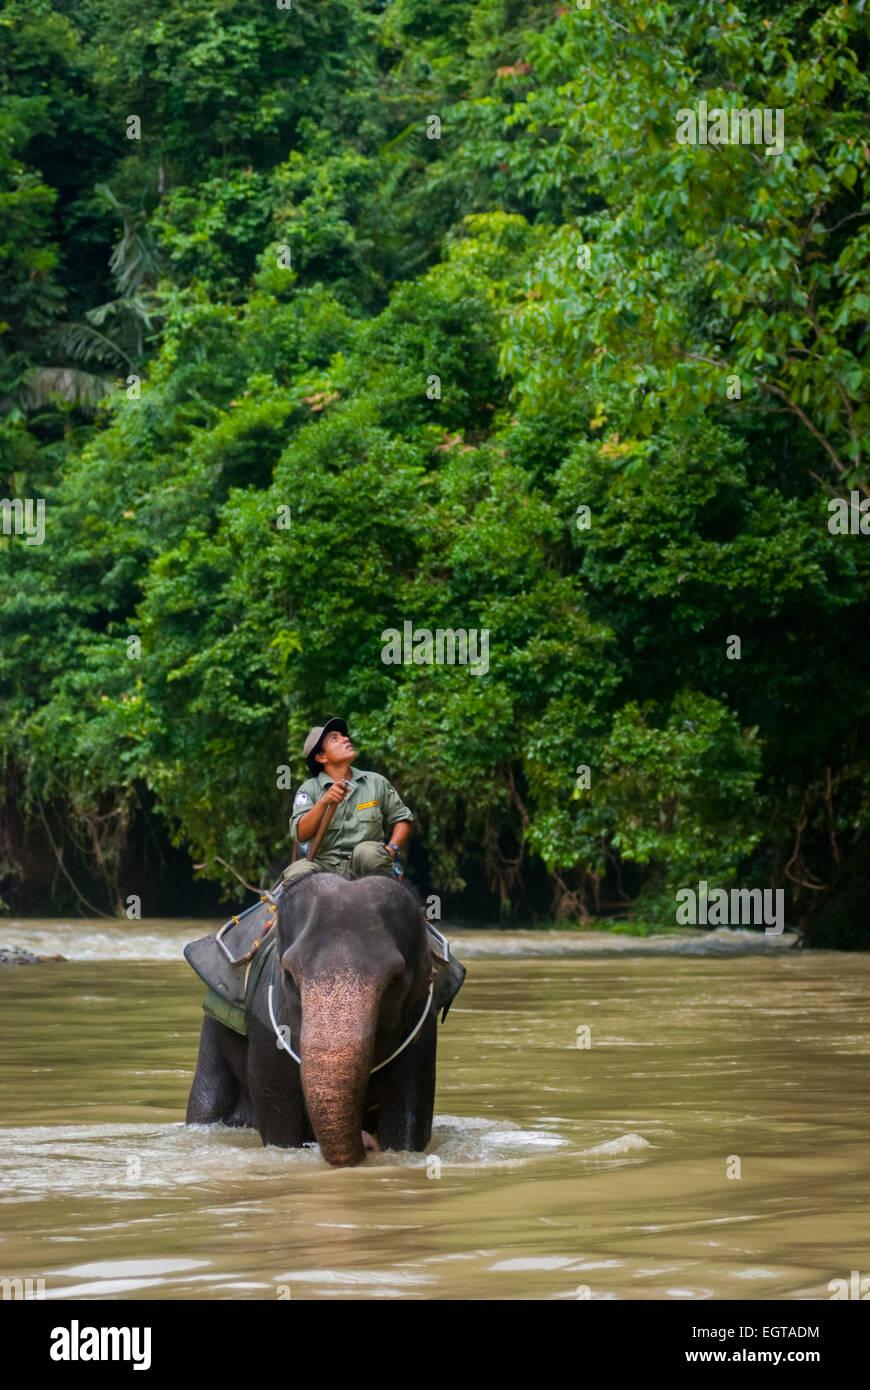 Elephant march in Gunung Leuser National Park, Sumatra, Indonesia. Stock Photo